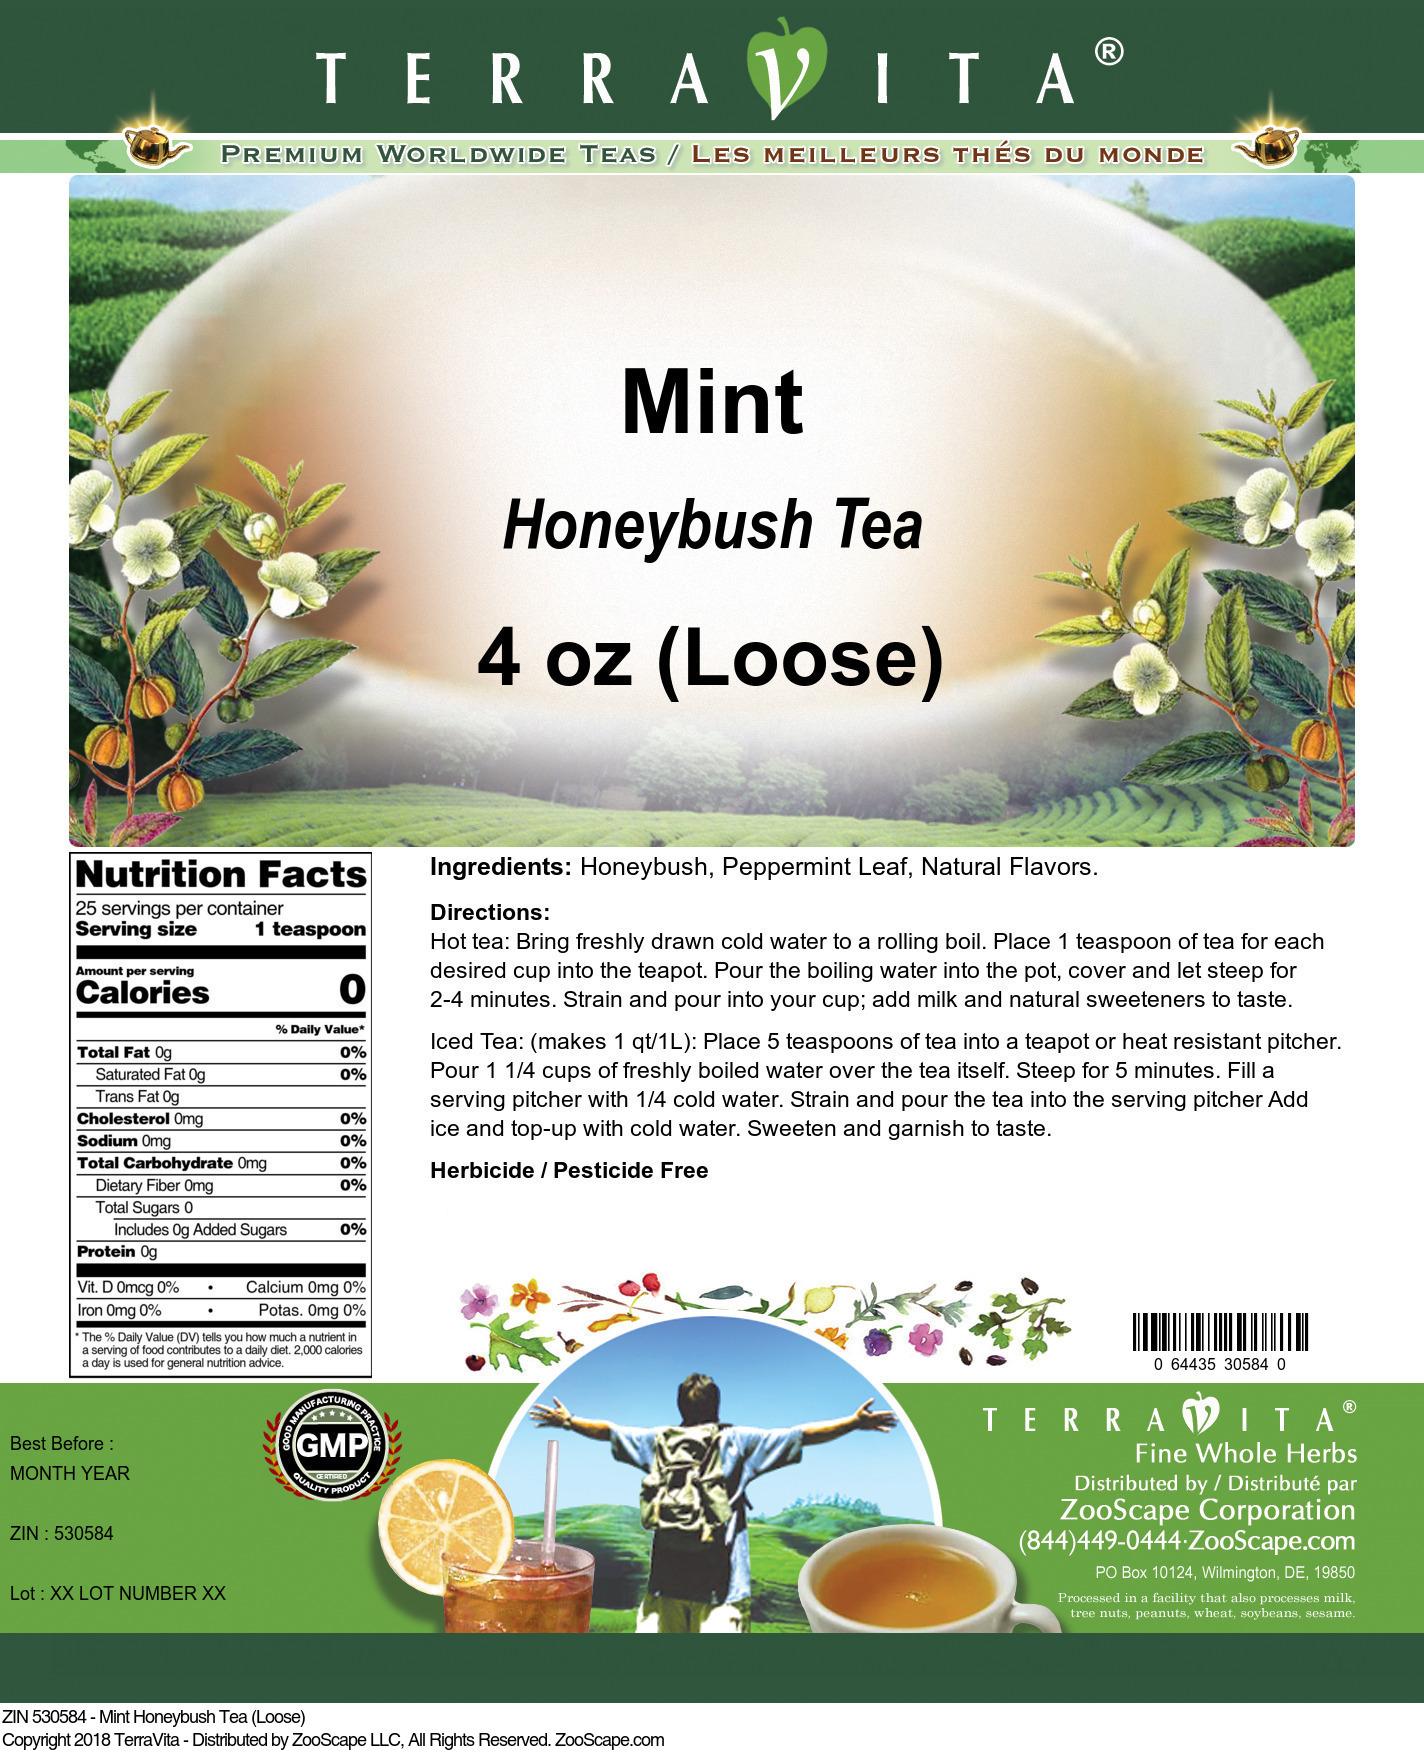 Mint Honeybush Tea (Loose)